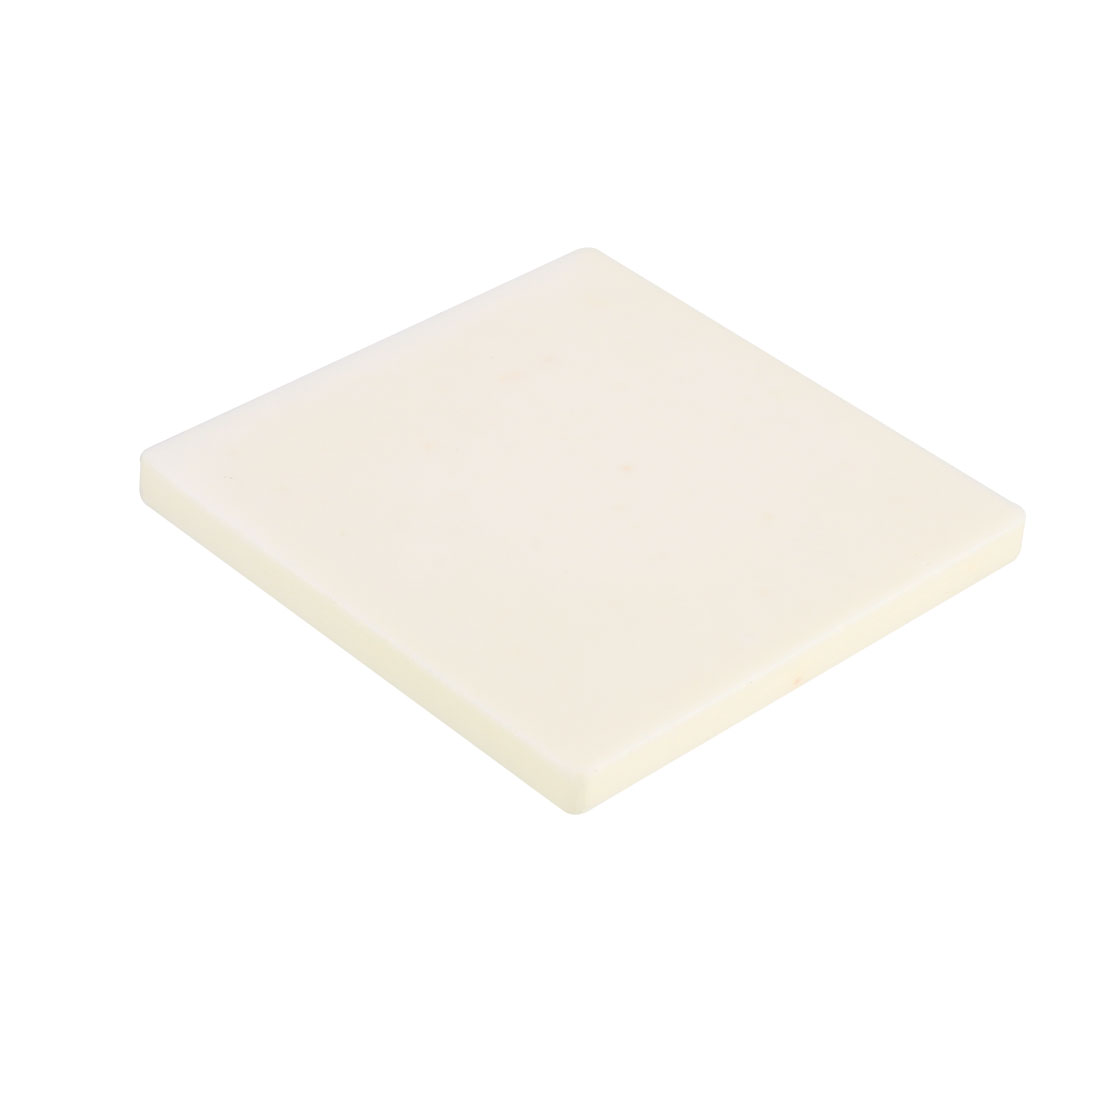 Soldering Board Ceramic Insulation Board 2.8 x 2.8 x 0.25inch/71 x 71 x 6.4mm